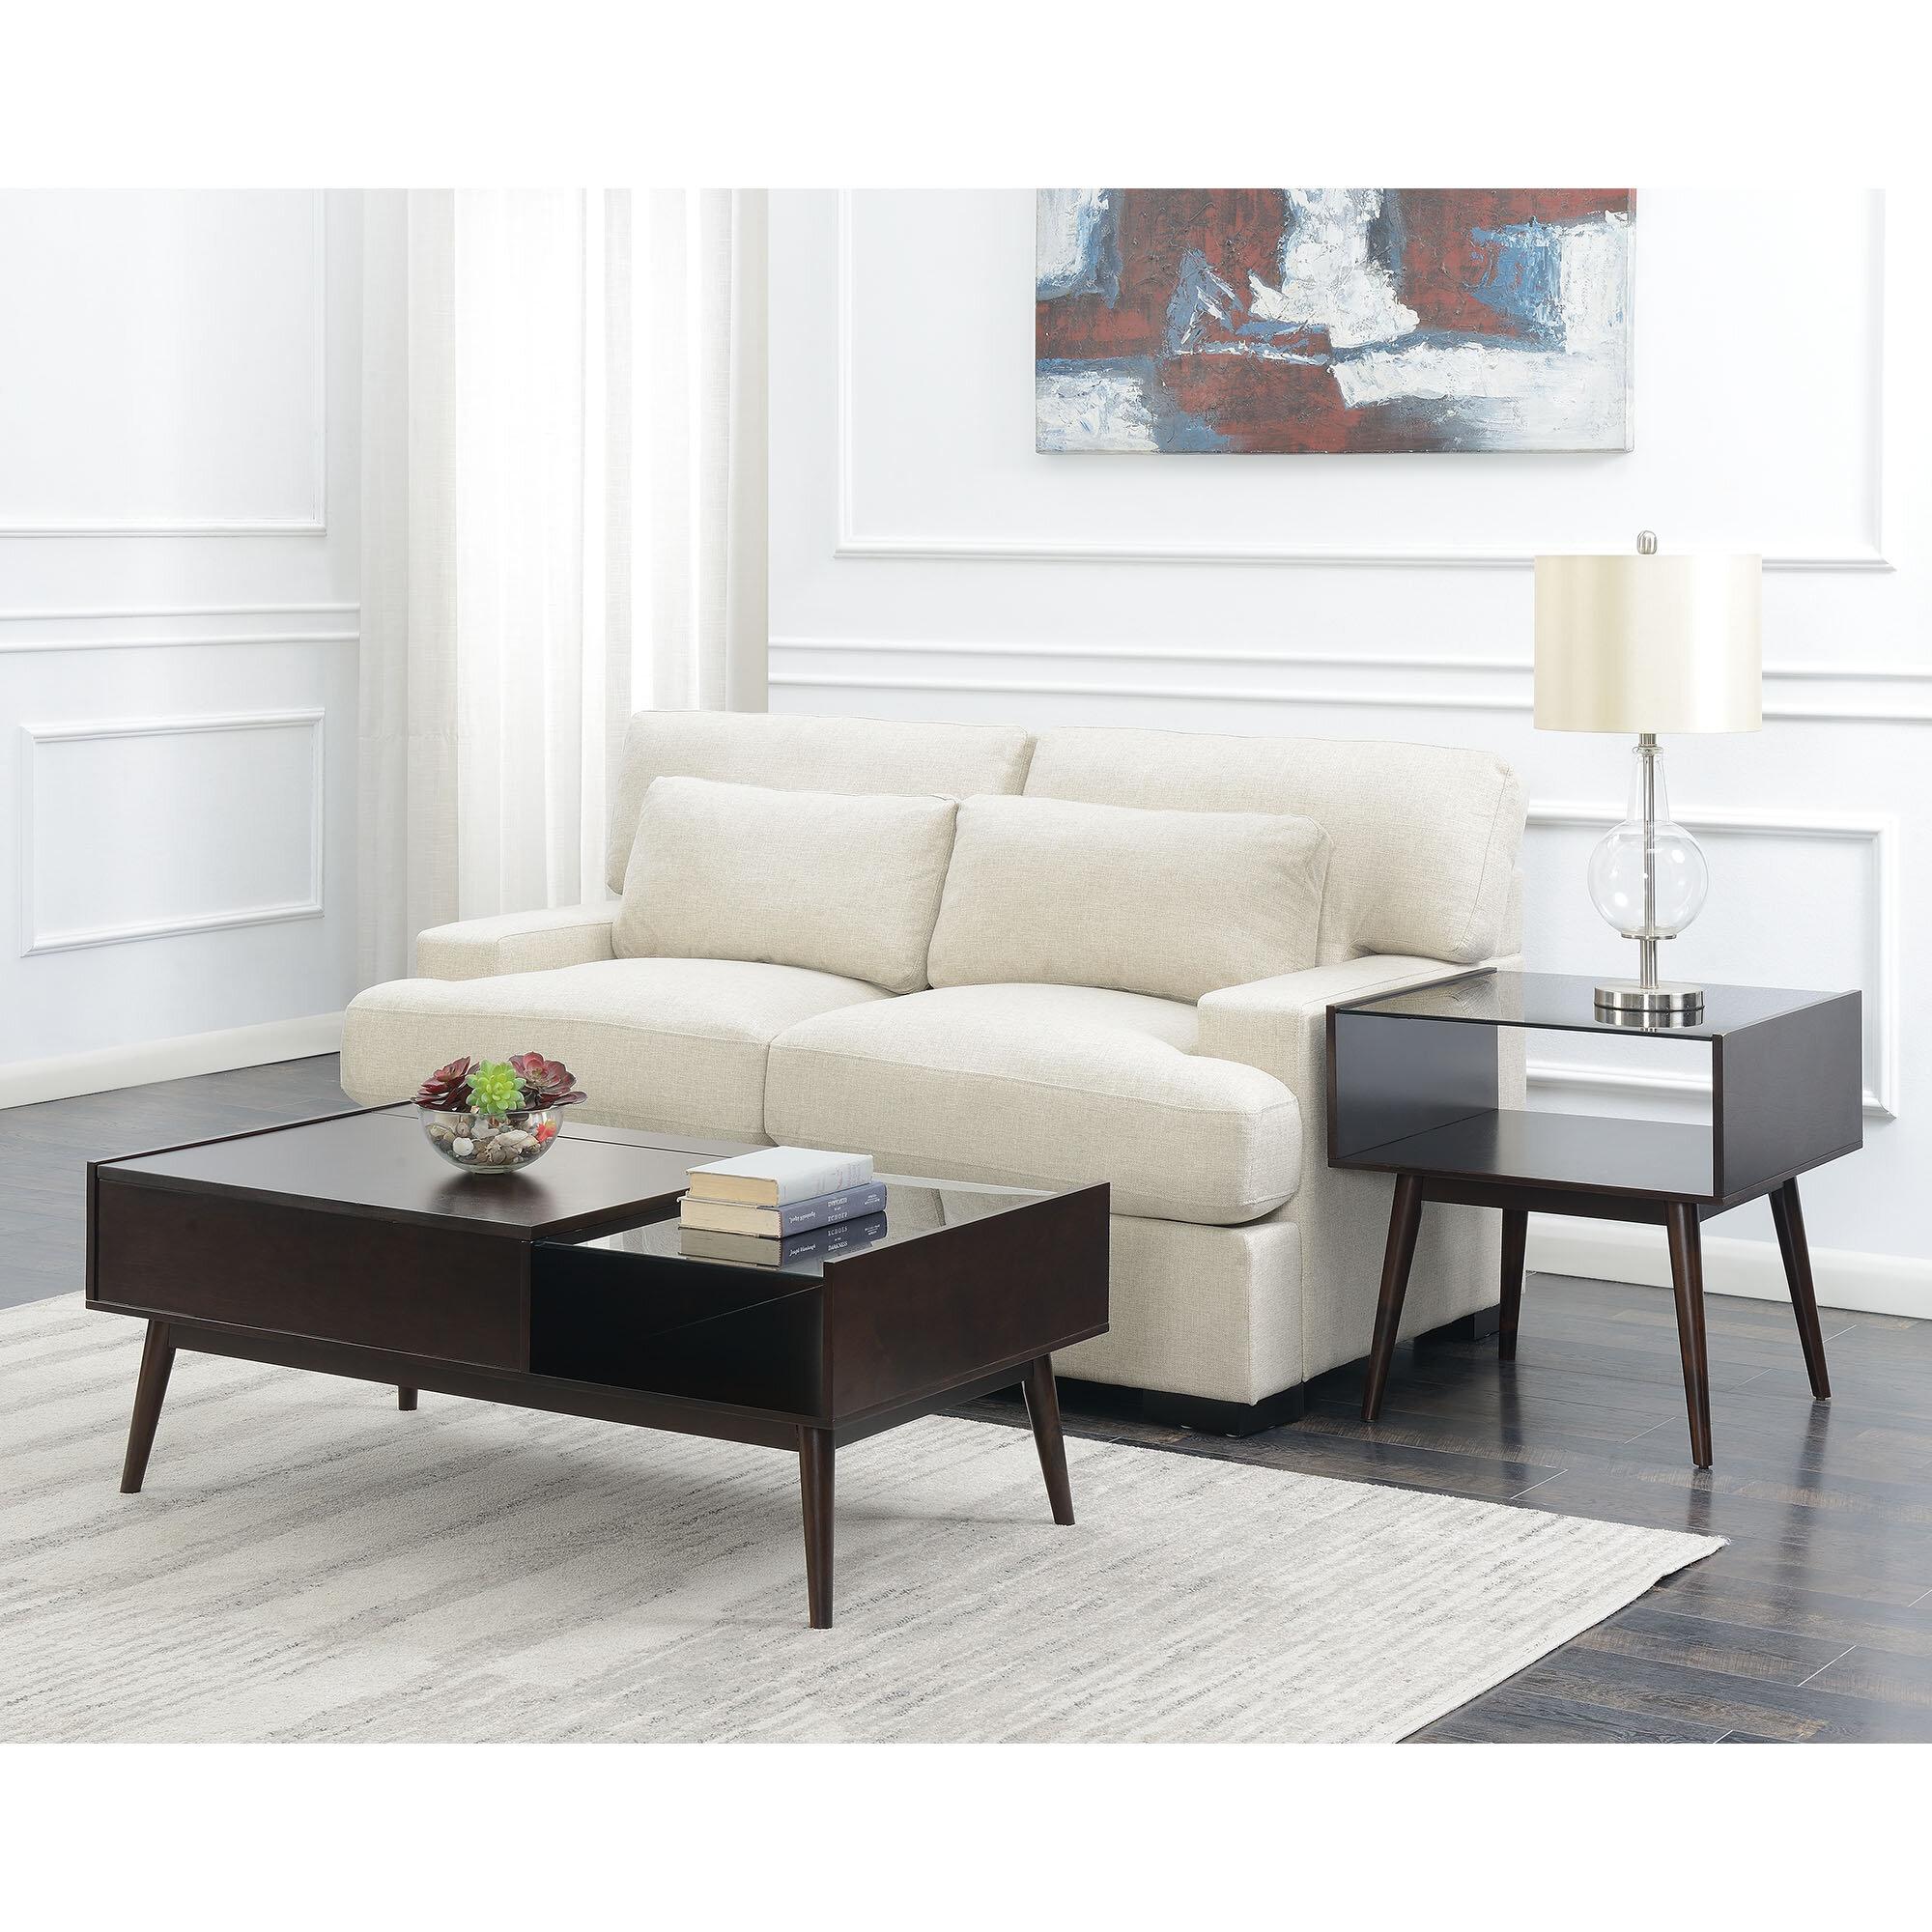 Corrigan studio ibrahim 2 piece coffee table set wayfair